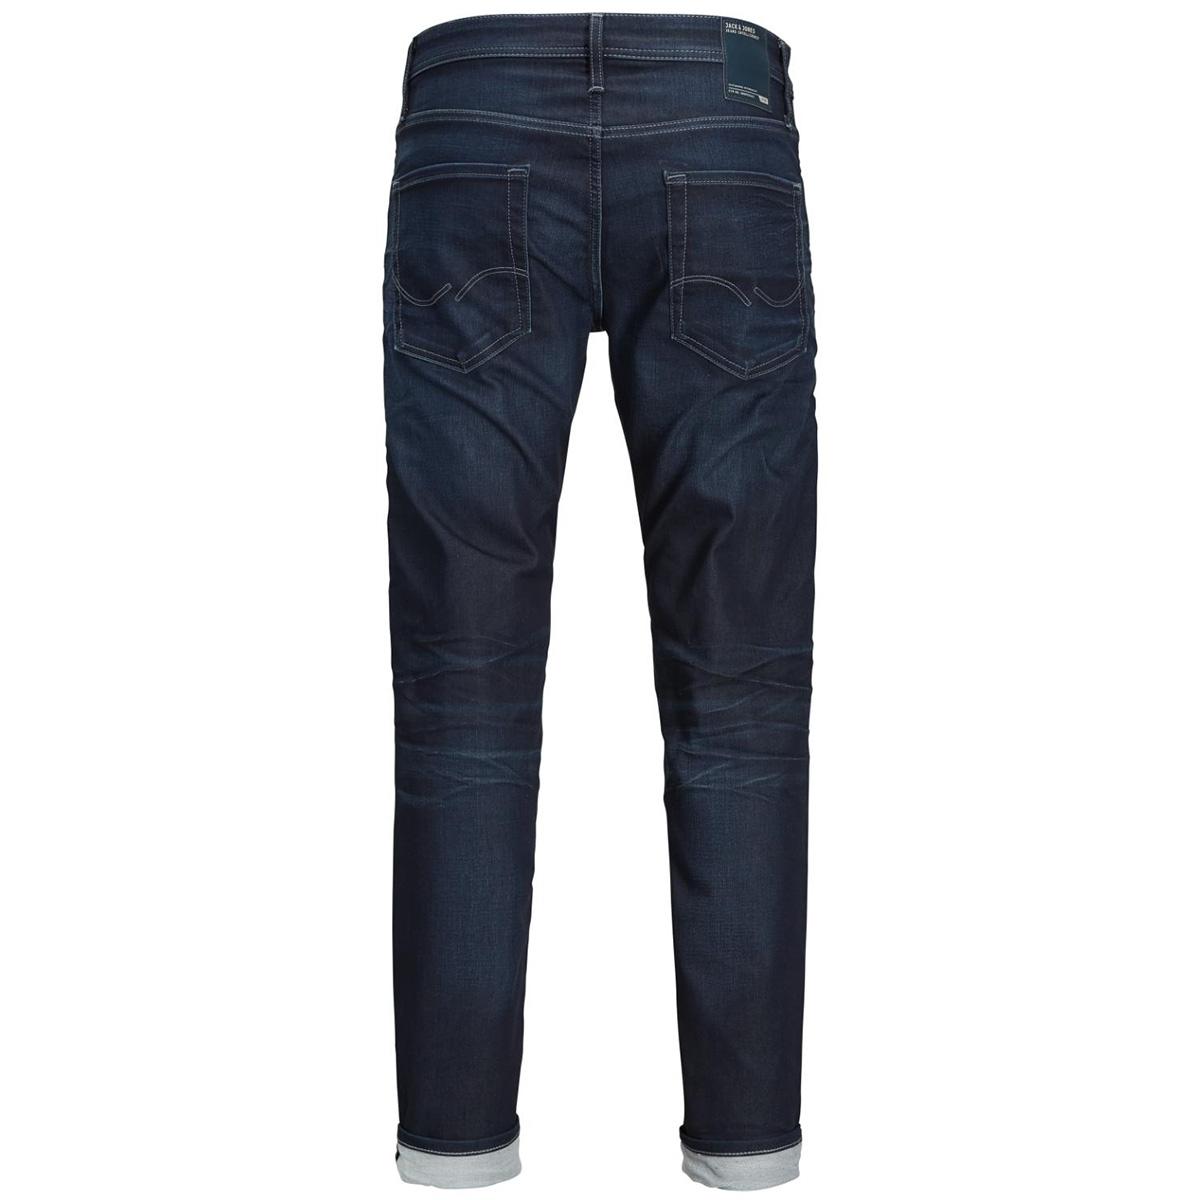 jjimike jjorg jos 097 id.k noos 12126066 jack & jones jeans blue denim